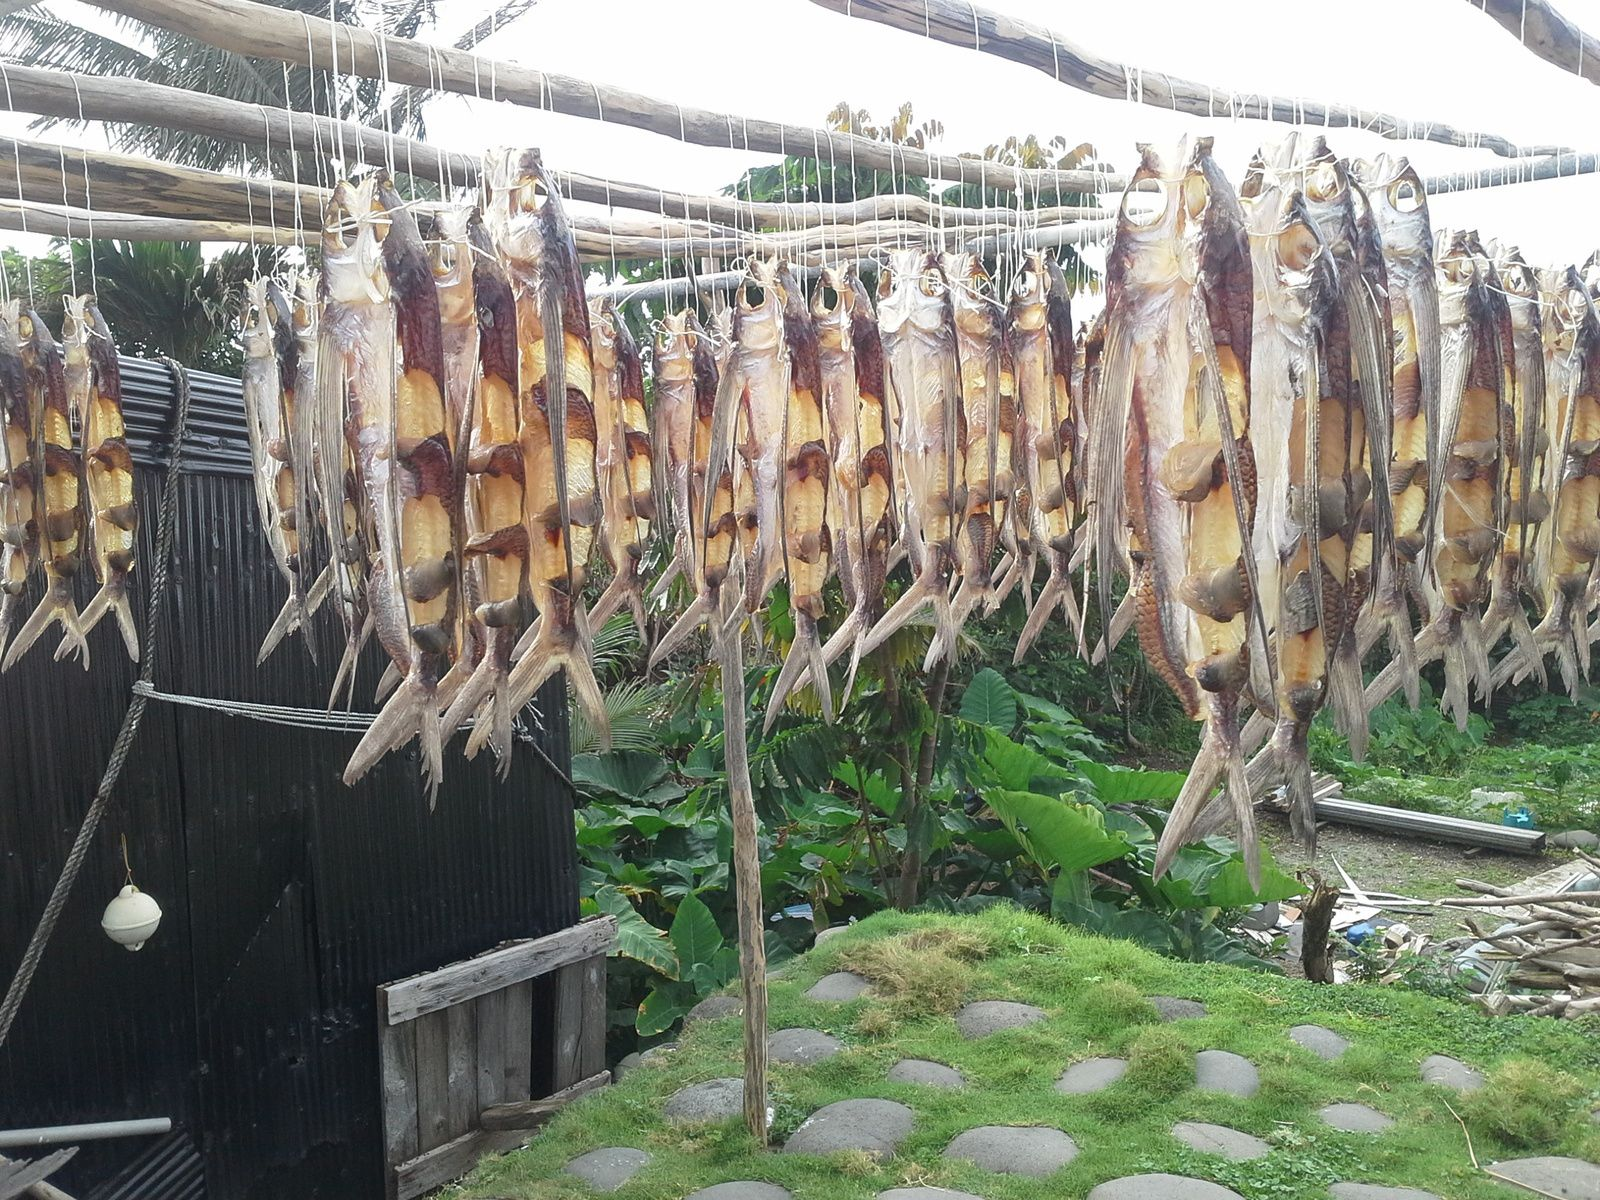 séchage du poisson